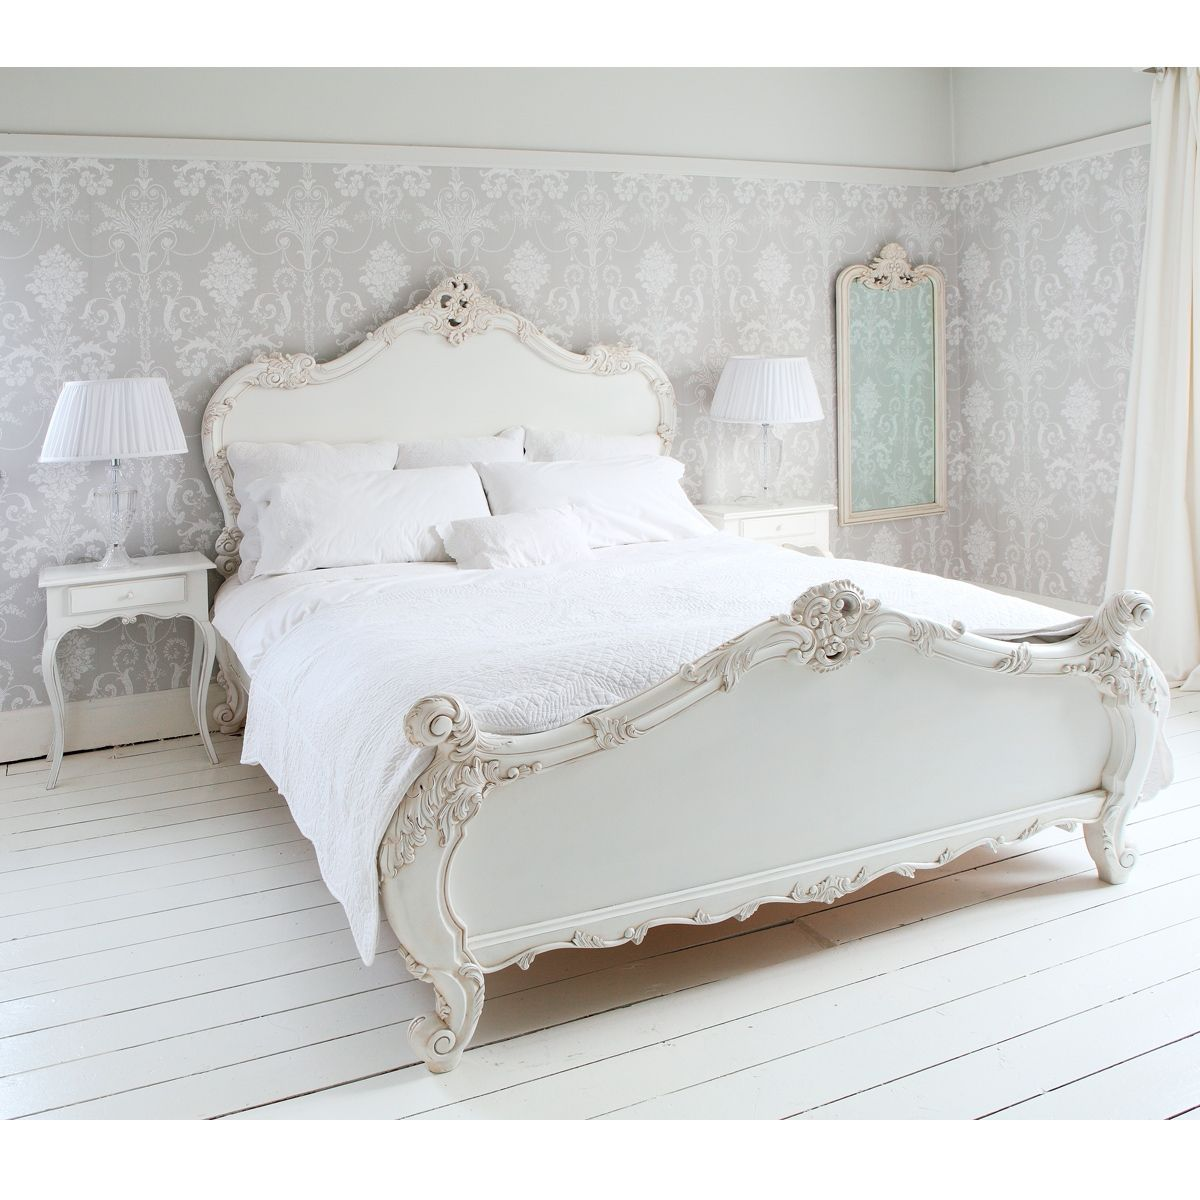 White boudoir bedroom furniture bedroom furniture pinterest